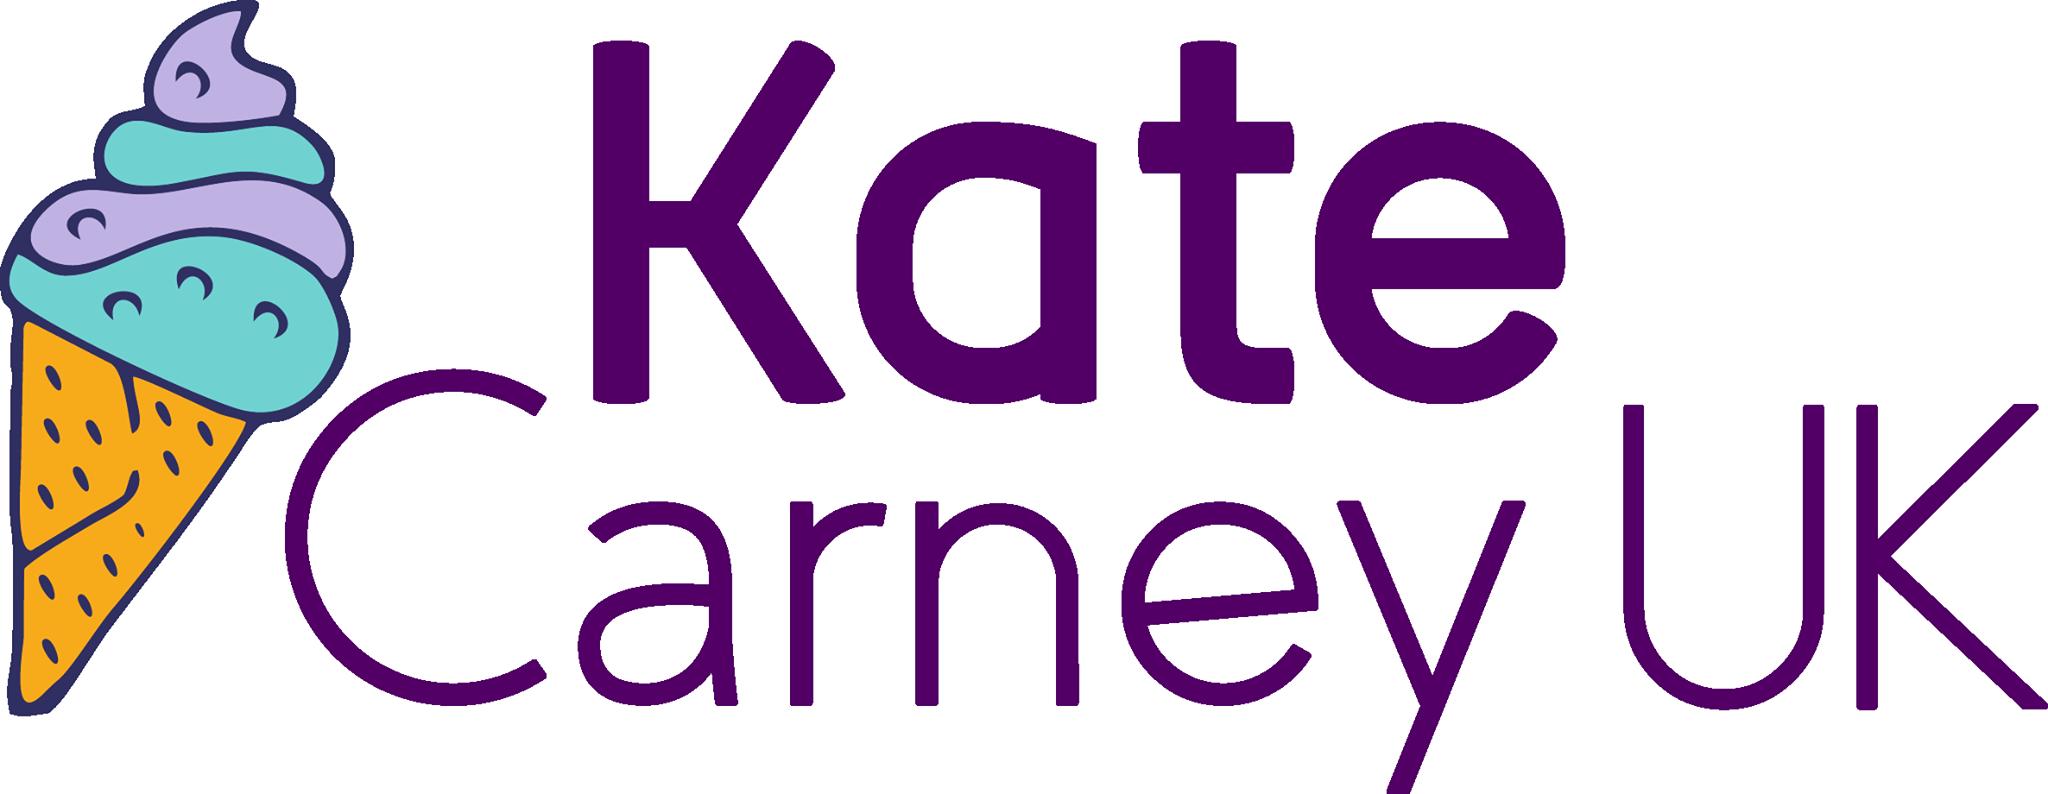 Kate Carney